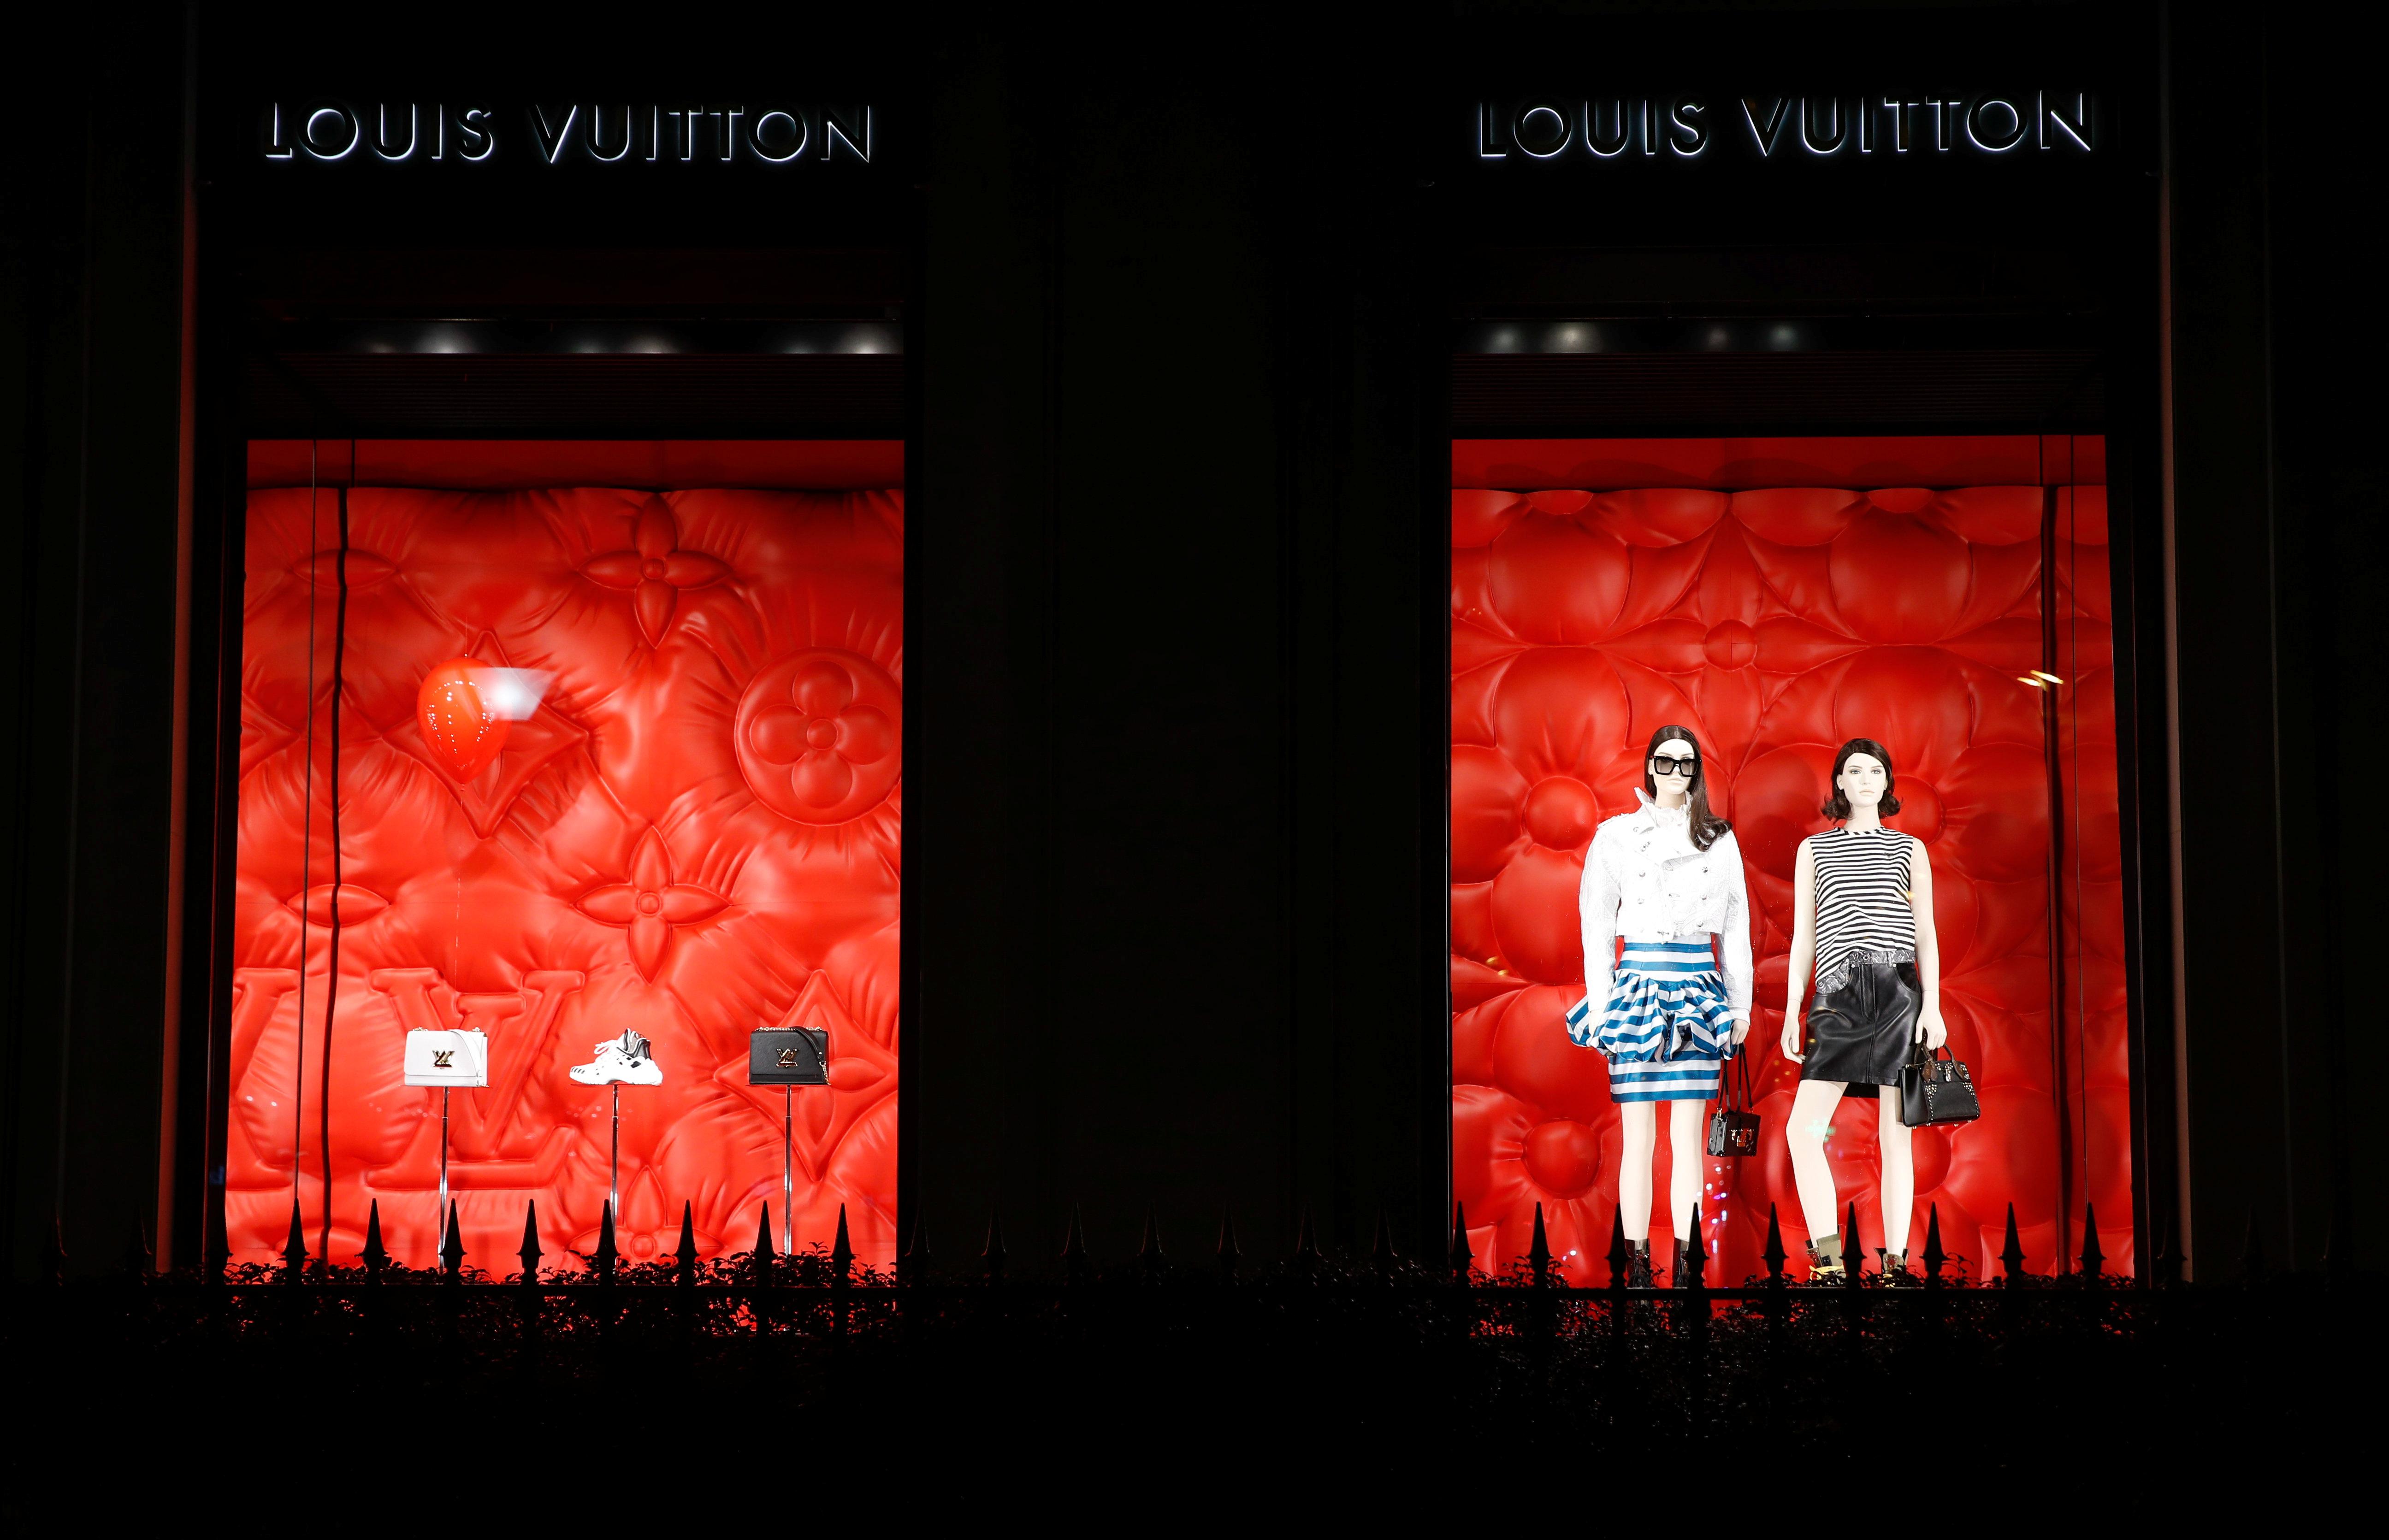 Louis Vuitton logo brad is seen outside a Louis Vuitton store in Paris, France, January 27, 2020. REUTERS/Gonzalo Fuentes/File photo